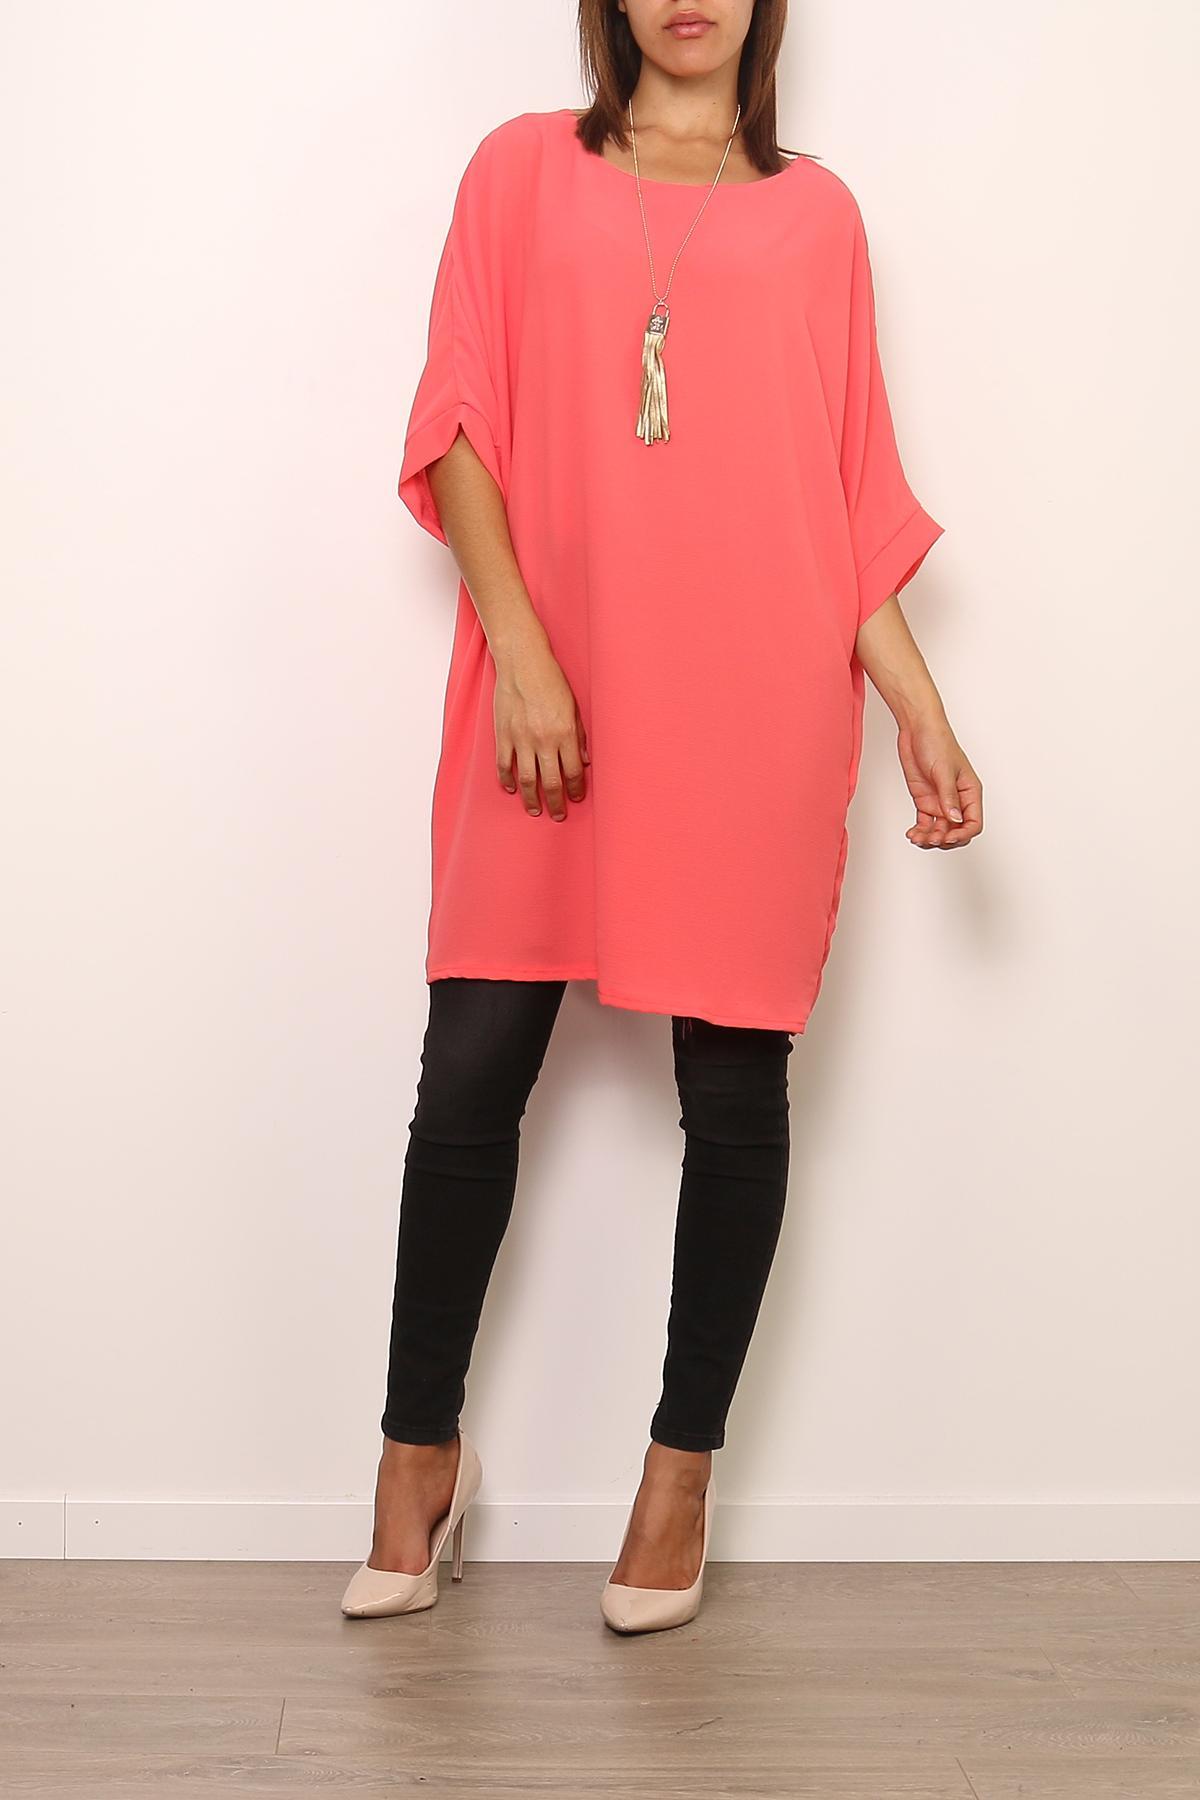 Robes courtes Femme 0643-CORAIL Medi Mode